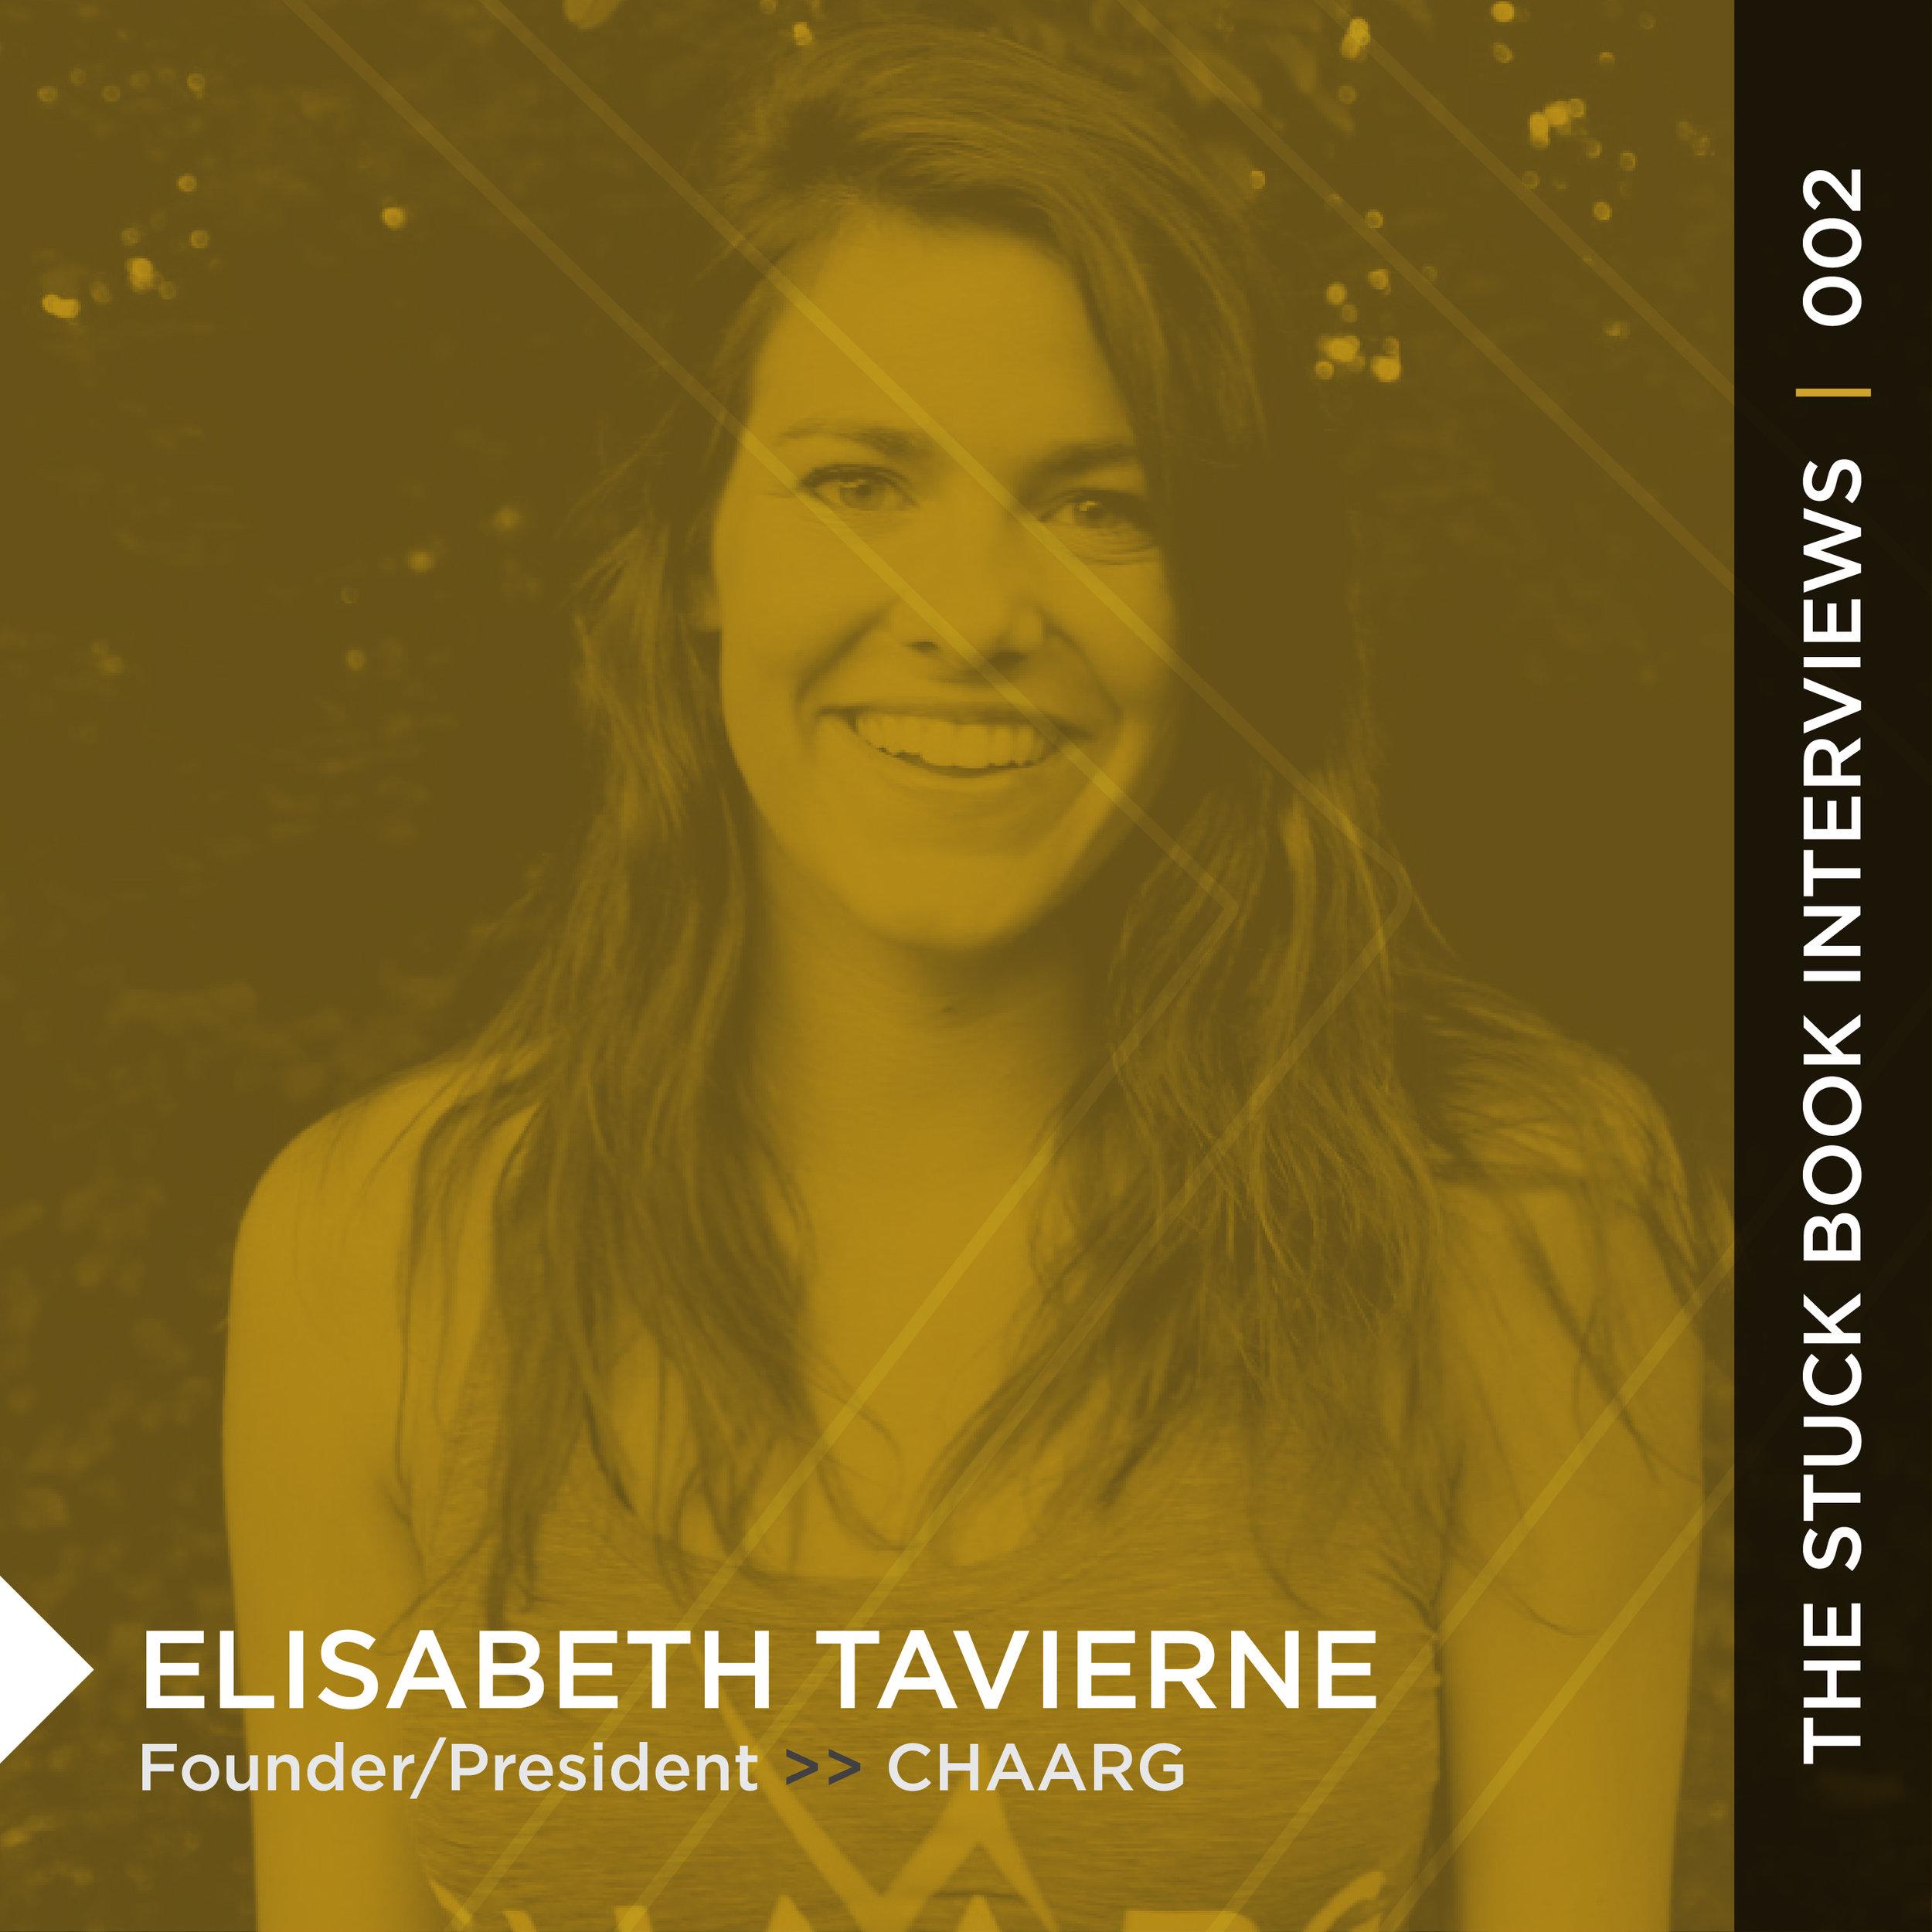 elisabeth-tavierne-002-01-01.jpg